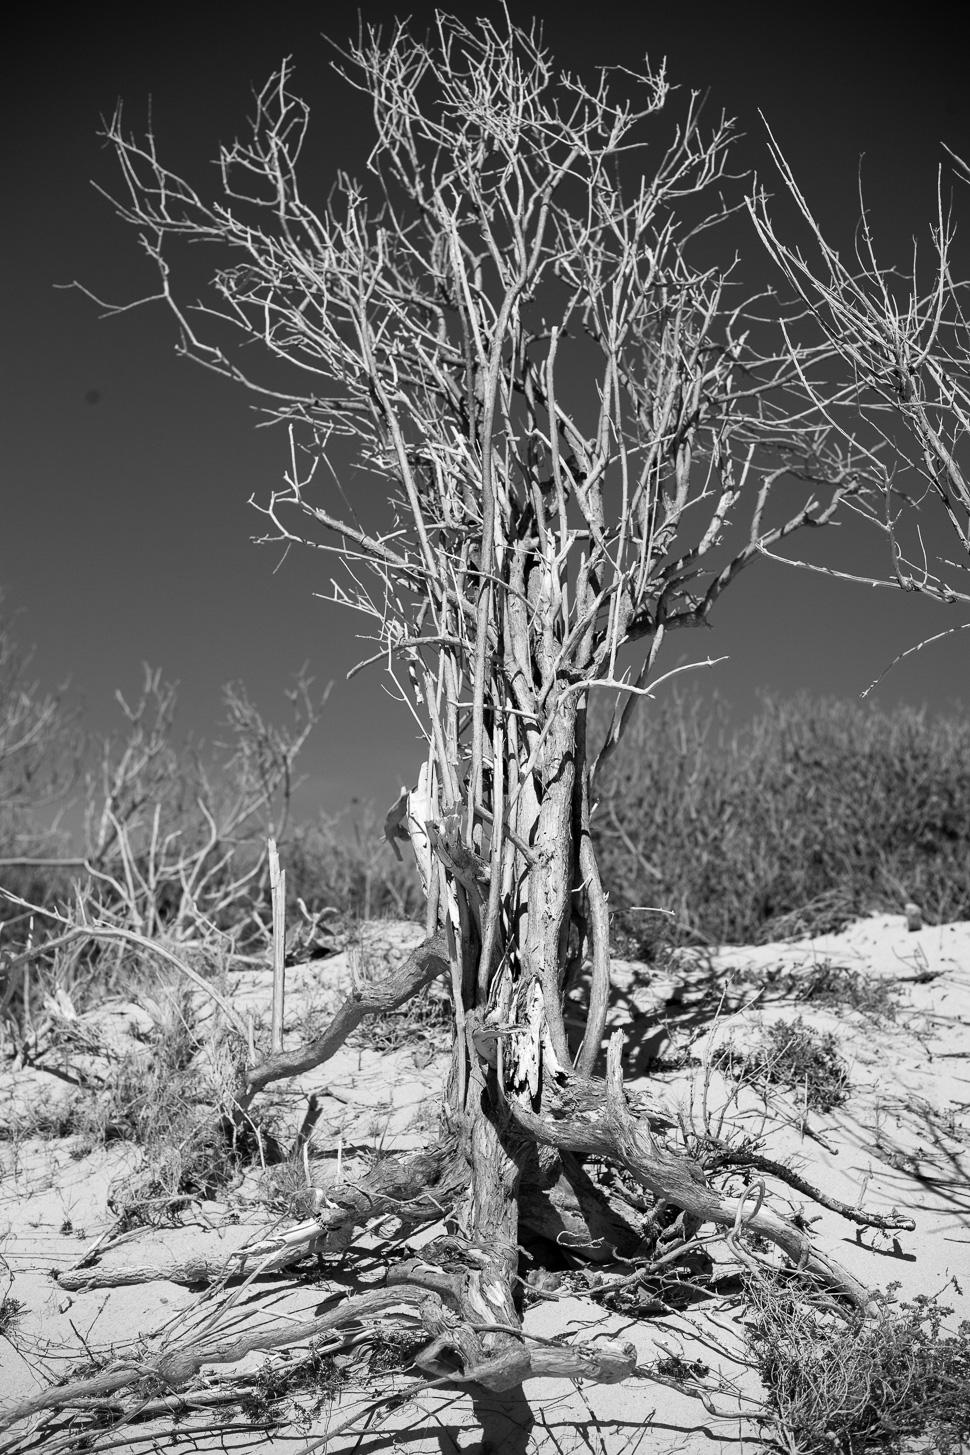 Tree / Arbre - Dune, Salines - Jan 2016